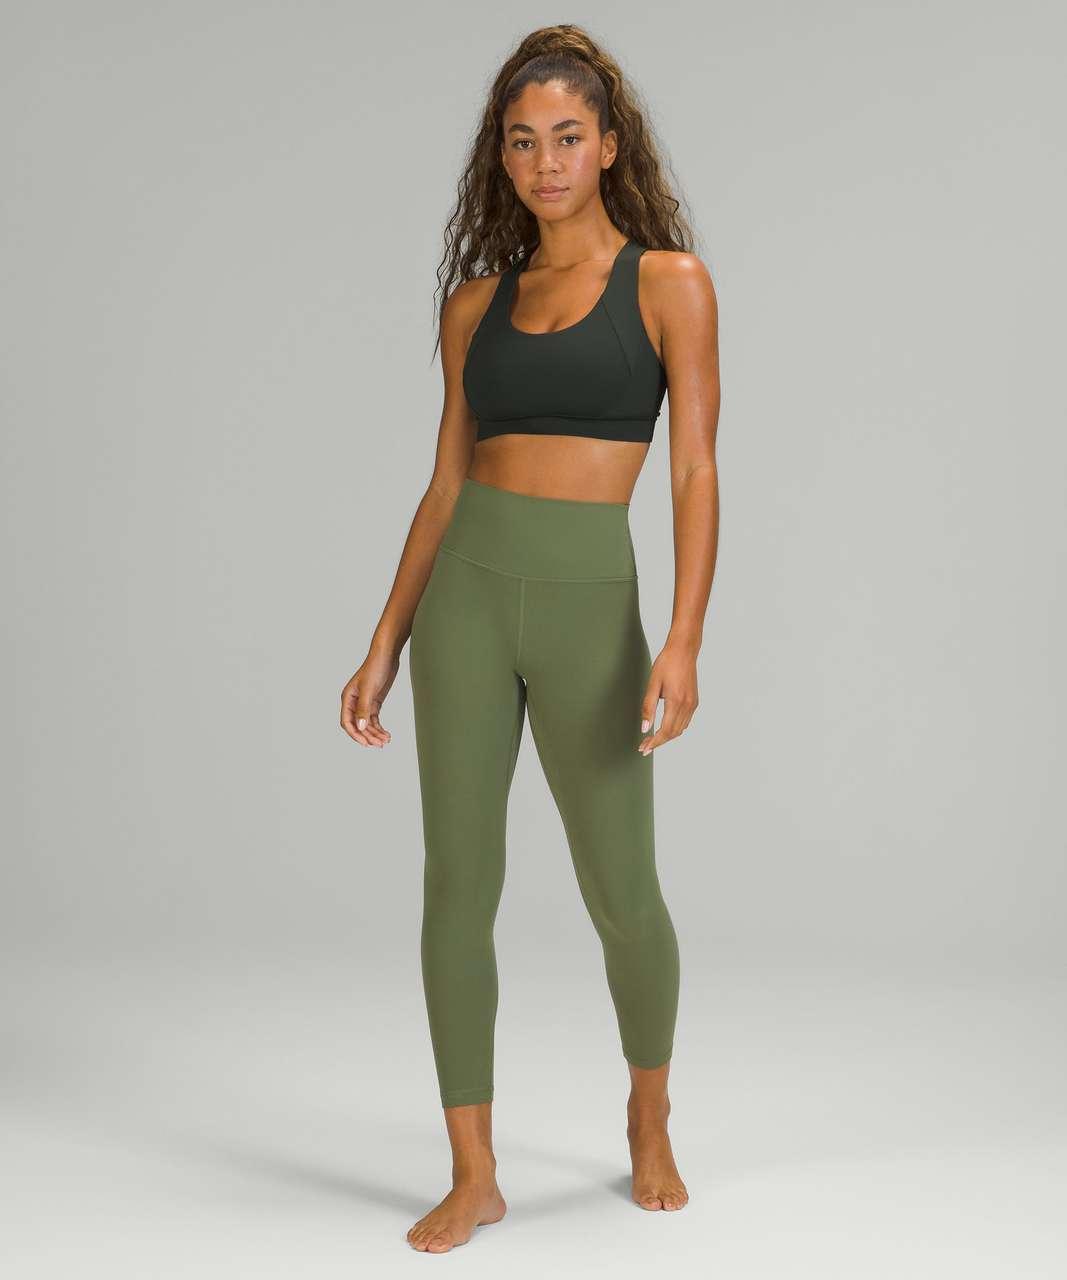 "Lululemon Align High-Rise Pant 25"" - Green Twill"